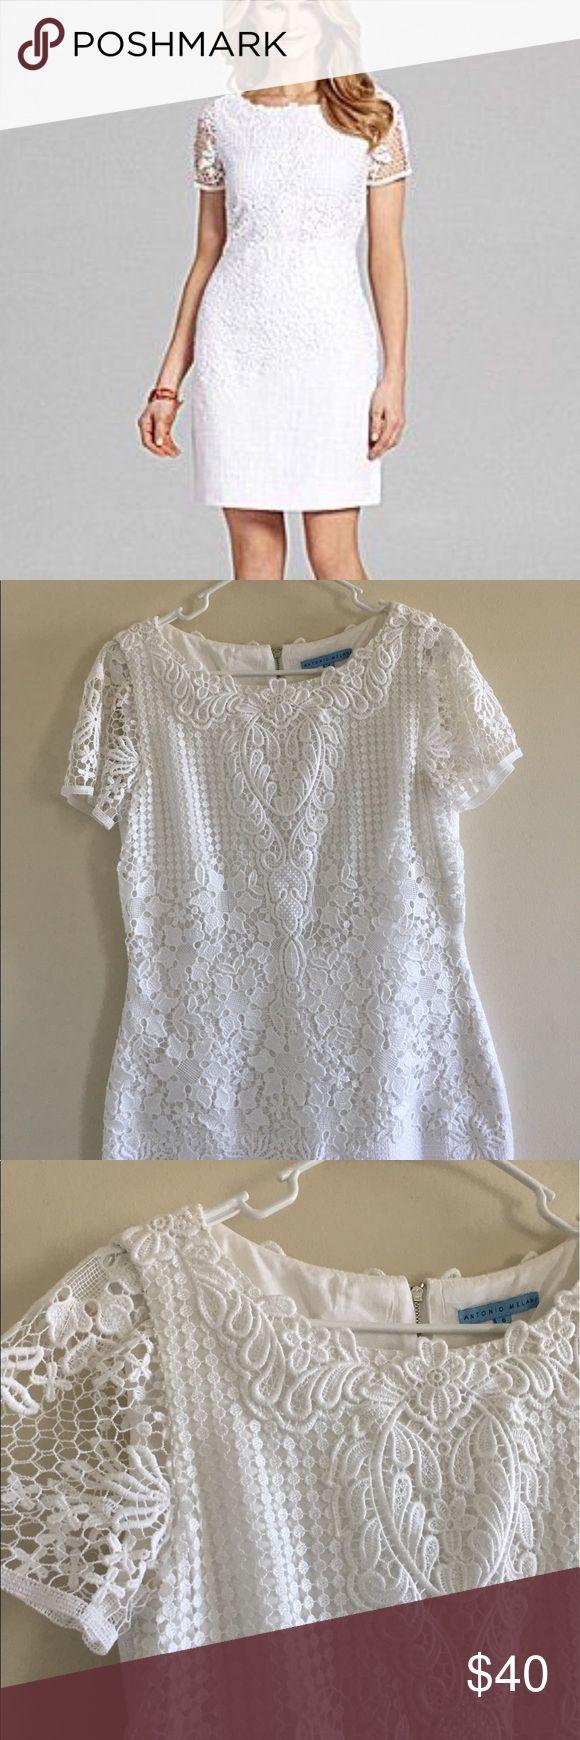 Antonio Melani Houston Dress size 6 Antonio Melani Dress size 6 color white crochet details zipper on back great condition like new!!! ANTONIO MELANI Dresses